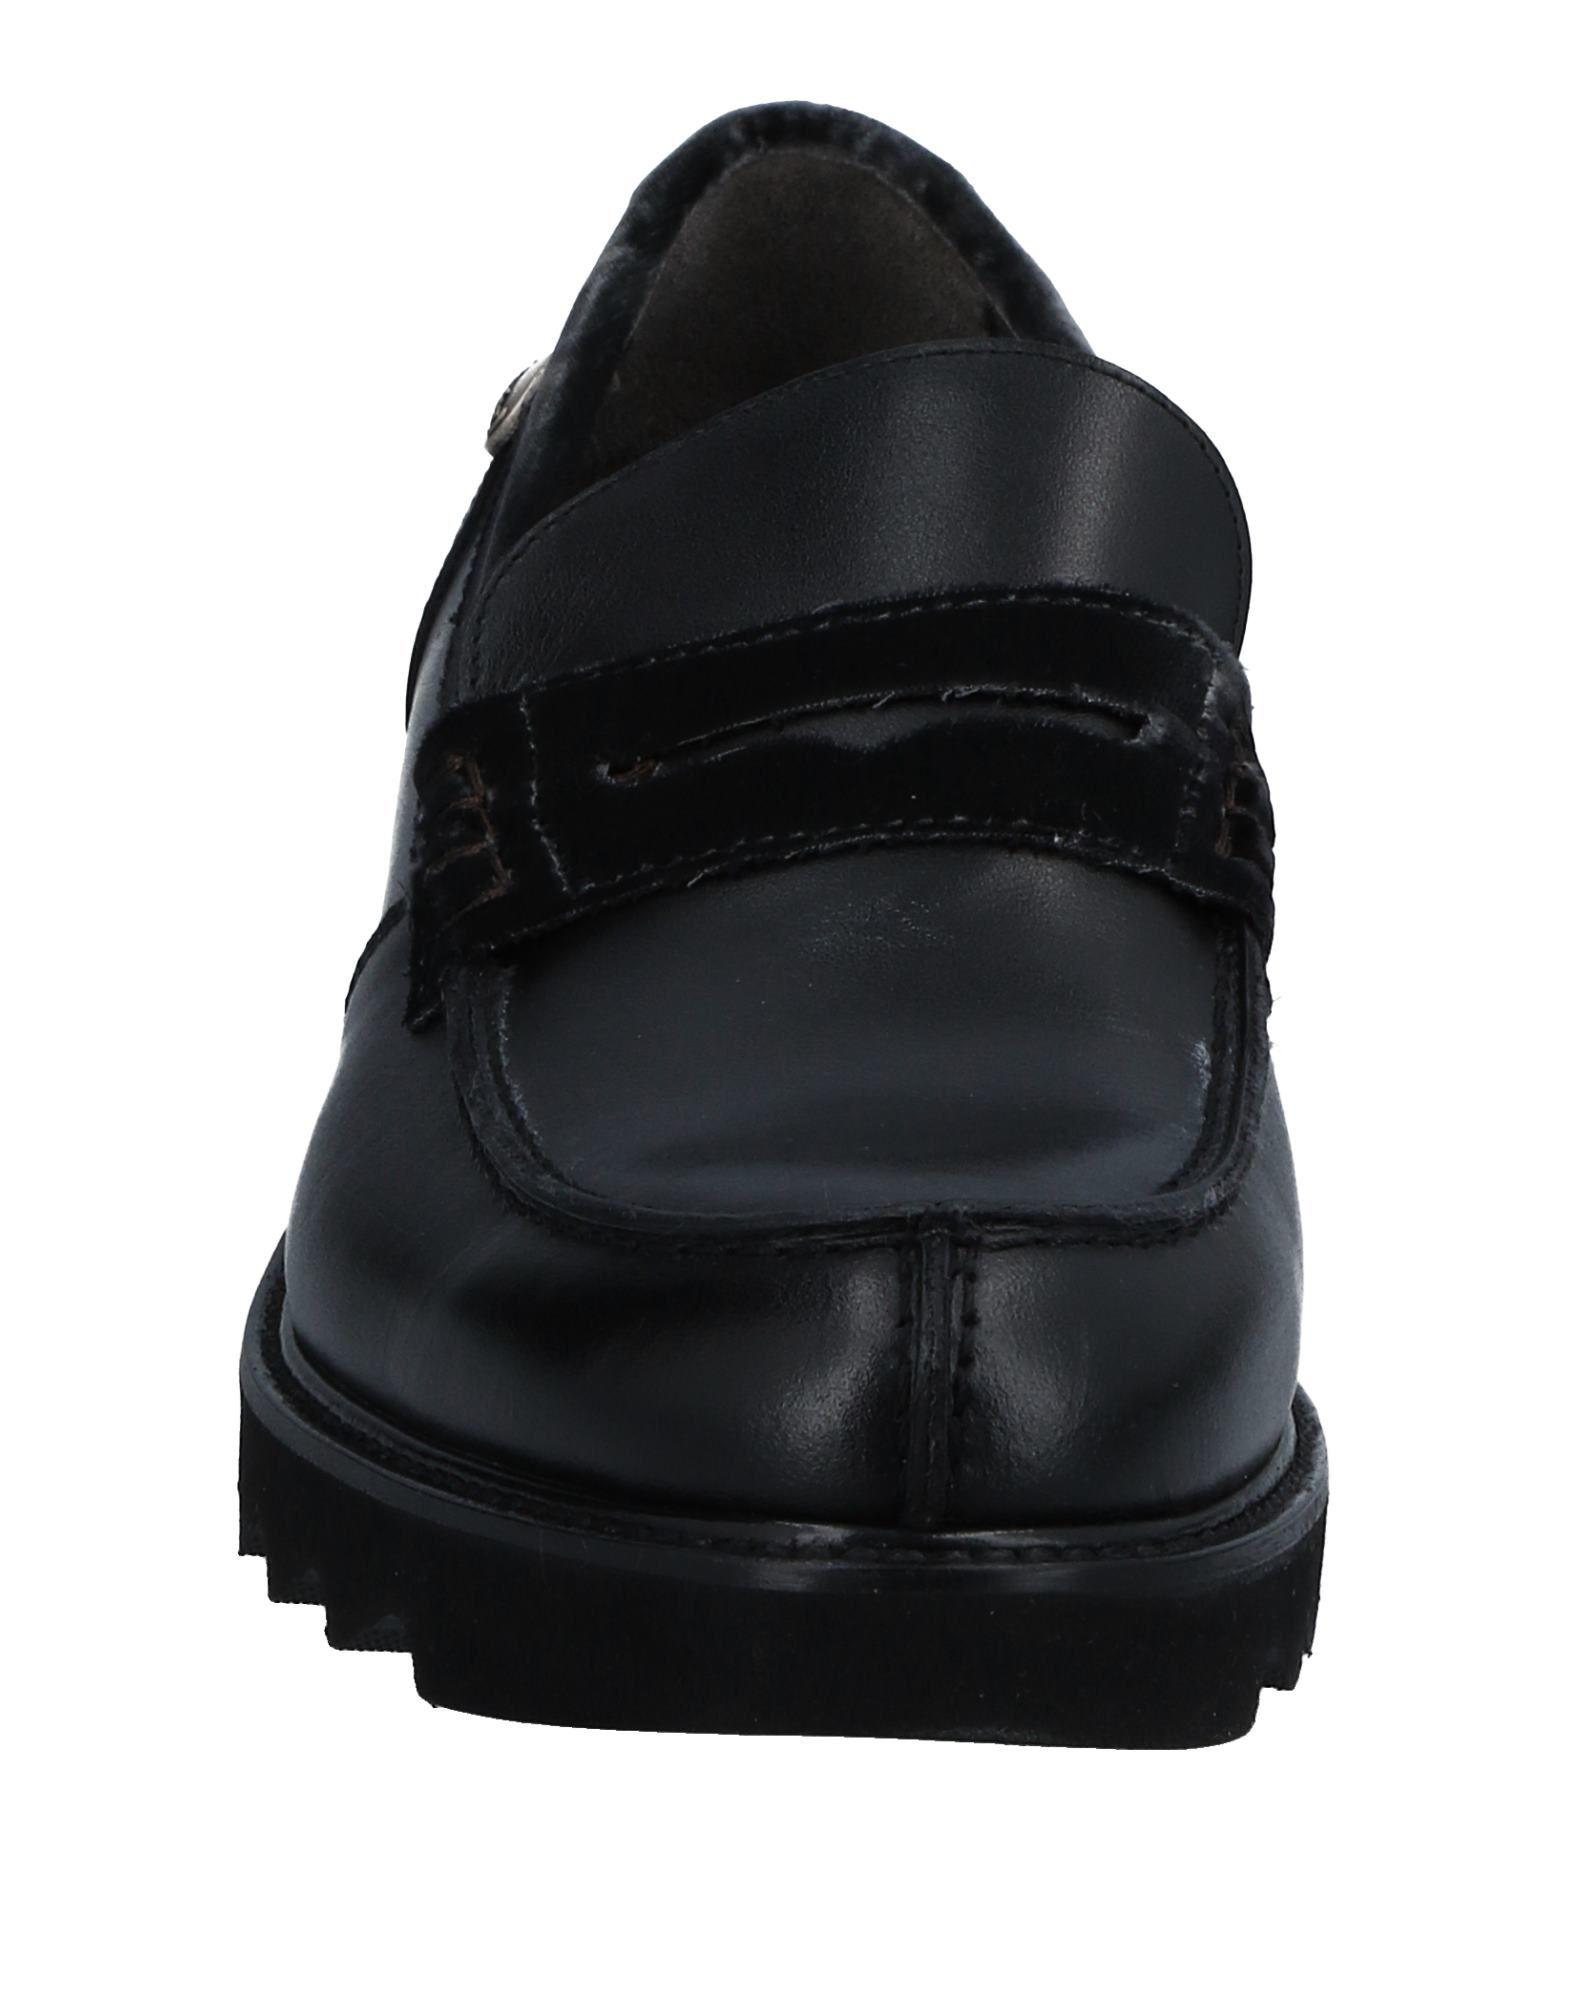 Rabatt echte Mokassins Schuhe ( Verba ) Mokassins echte Herren  11510458VB 4905f0